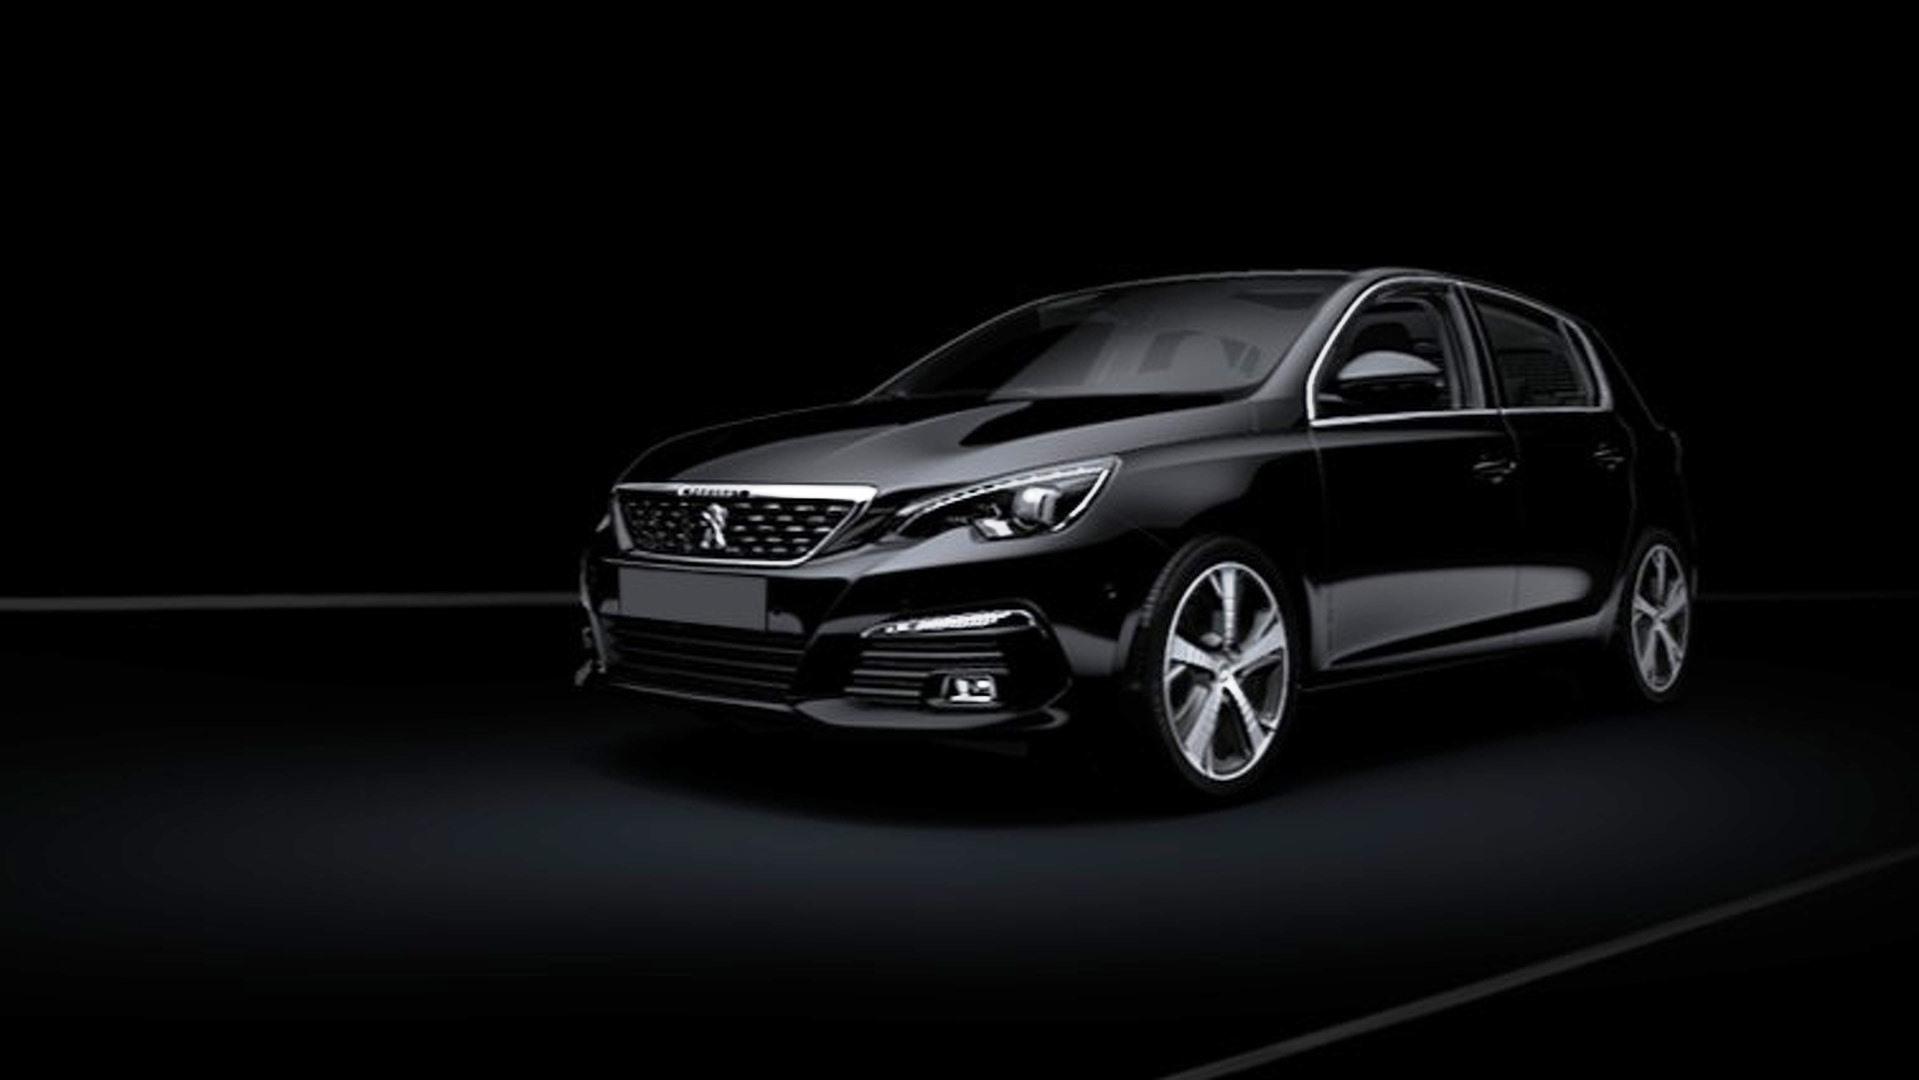 Peugeot 308 Facelift 2018 leaked (2)